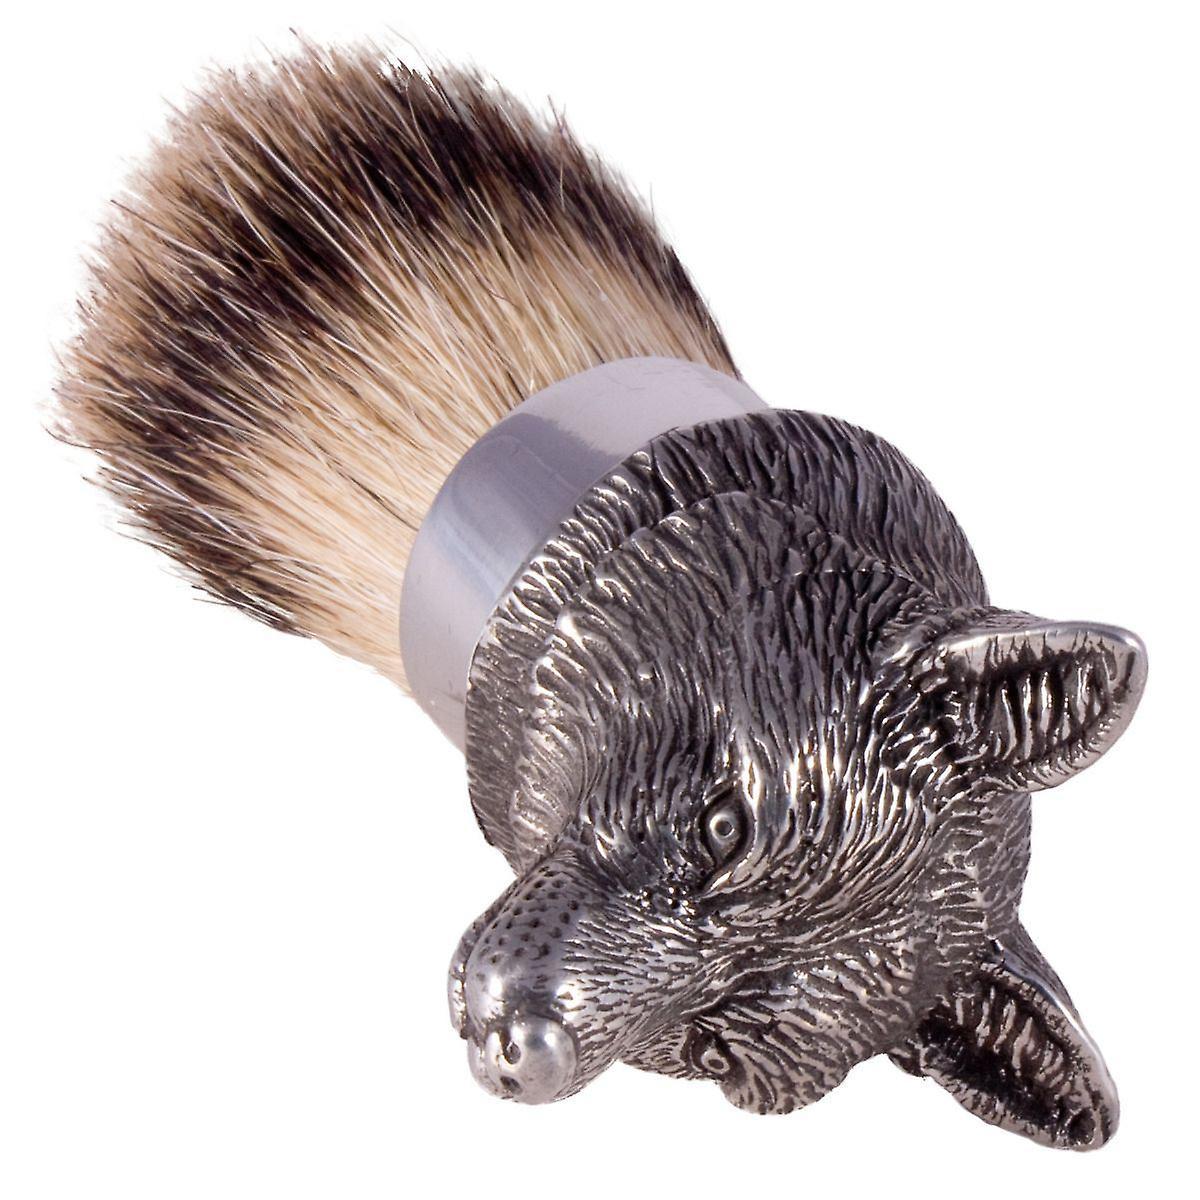 The English Pewter Co Silvertip Badger Hair Shaving Brush-Fox